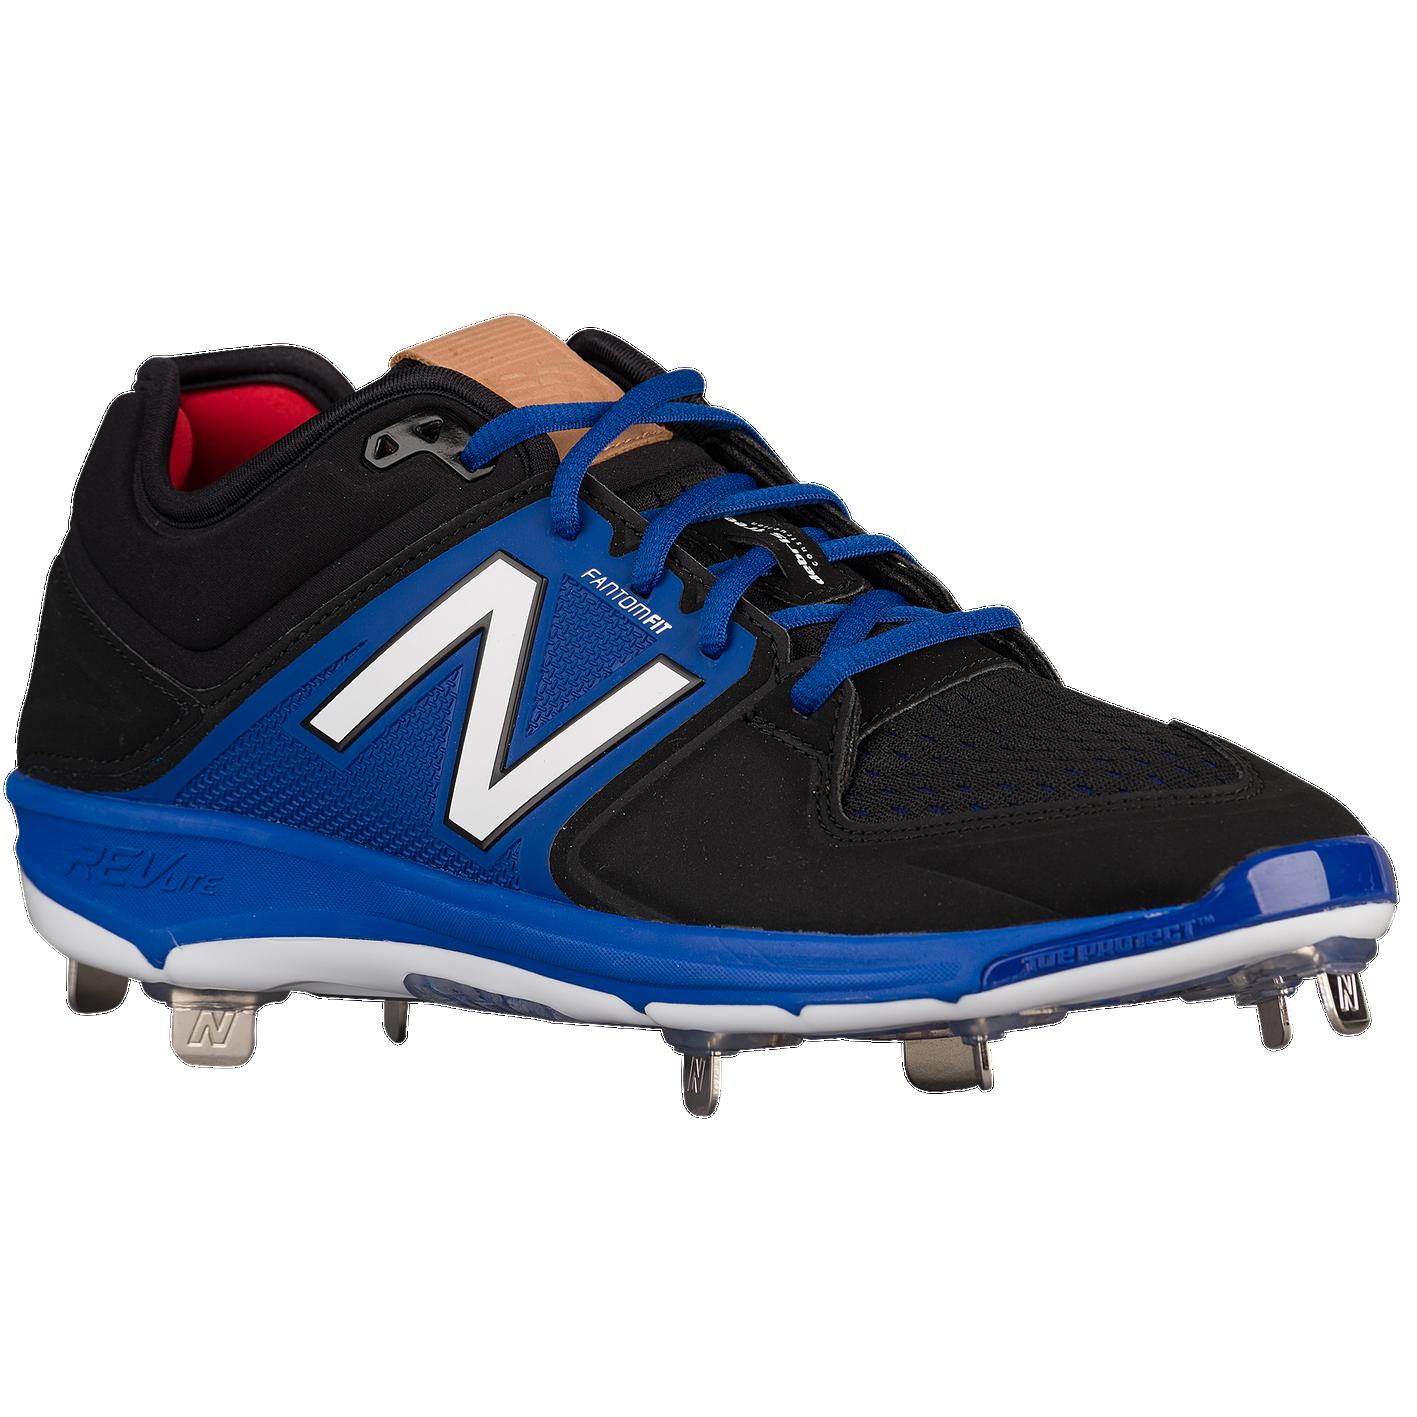 d74a15a0d59 New Balance 3000V3 Metal Low - Men s - Baseball - Shoes - Black Royal